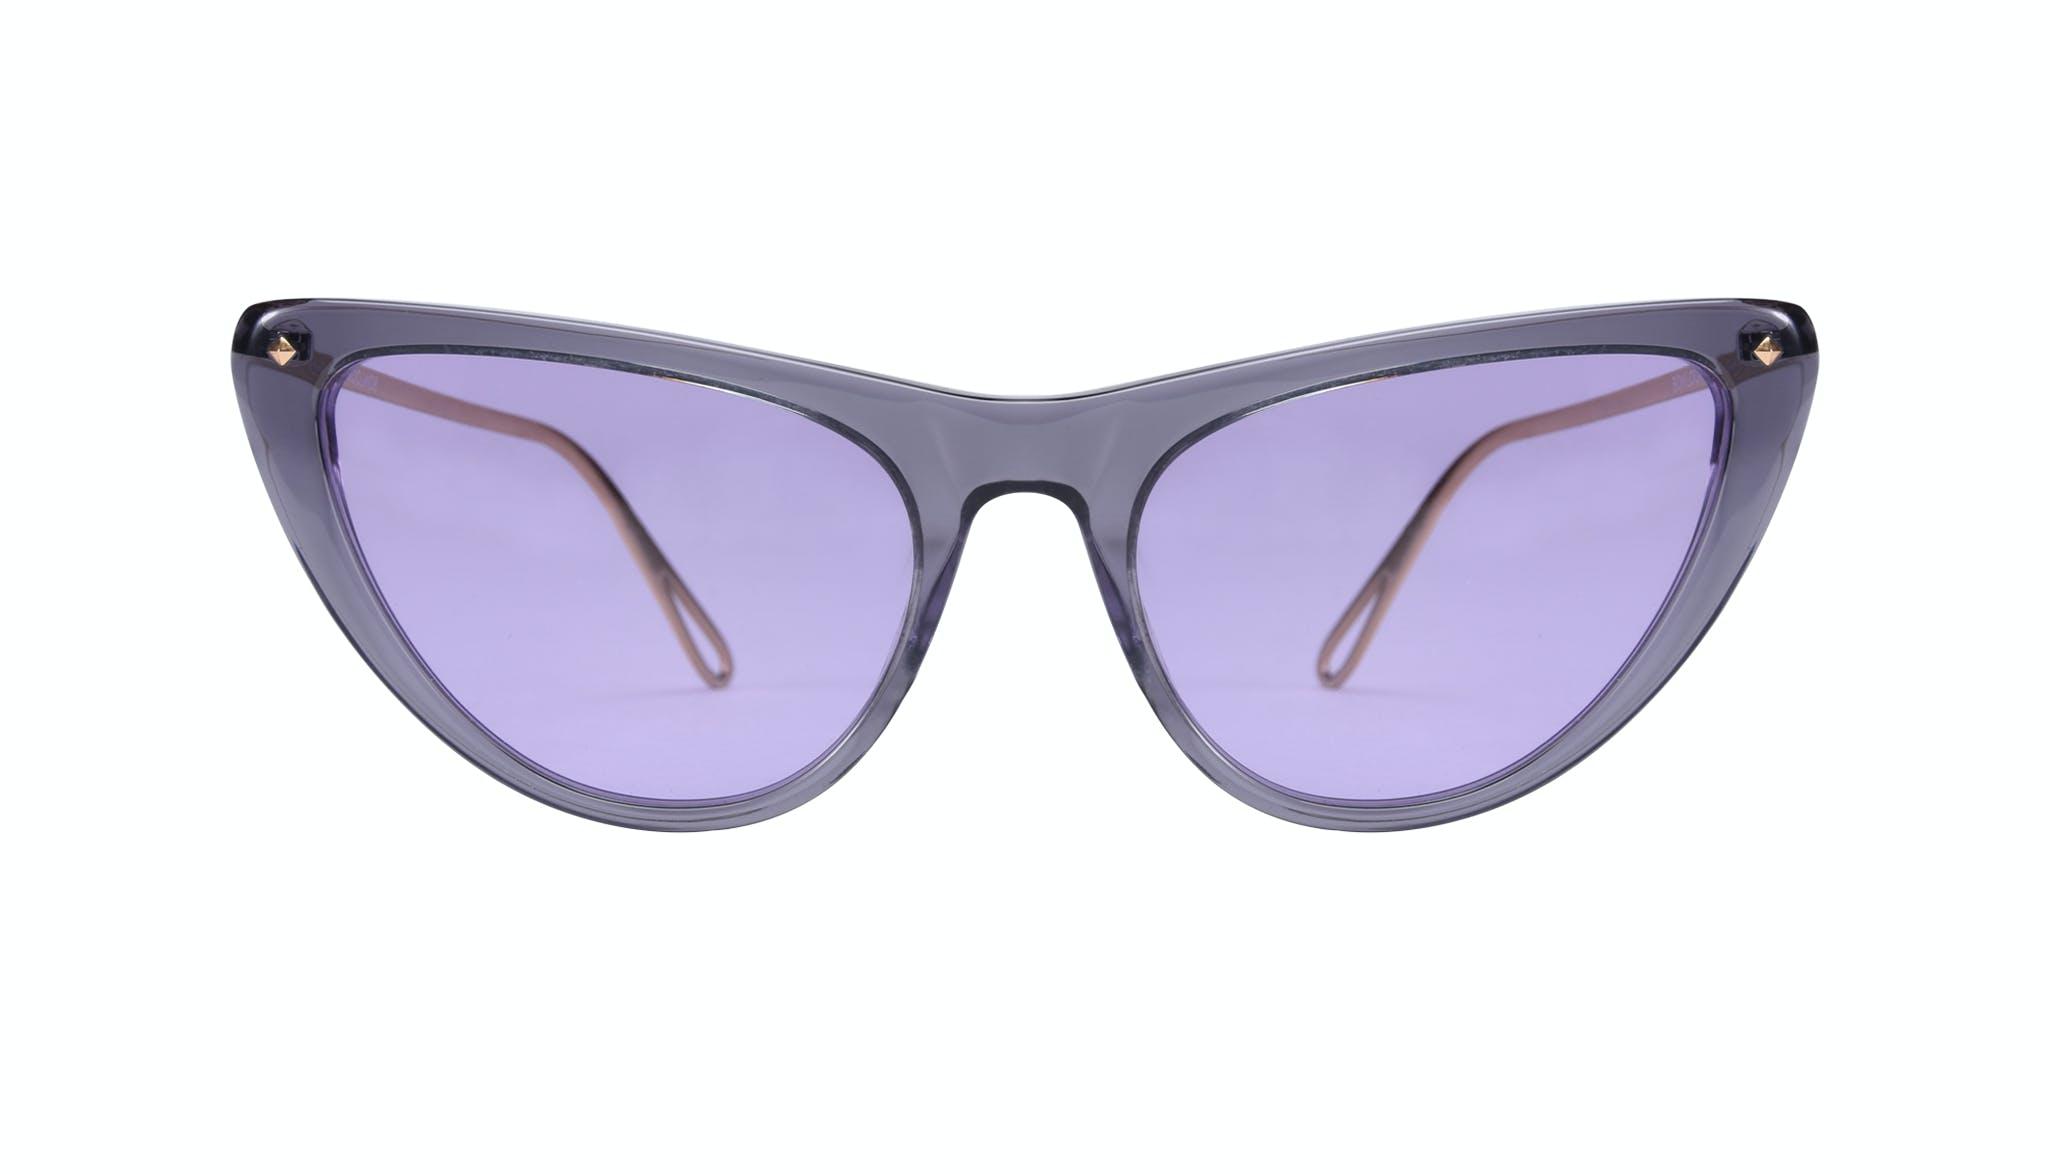 Affordable Fashion Glasses Cat Eye Sunglasses Women Celeste Shadow